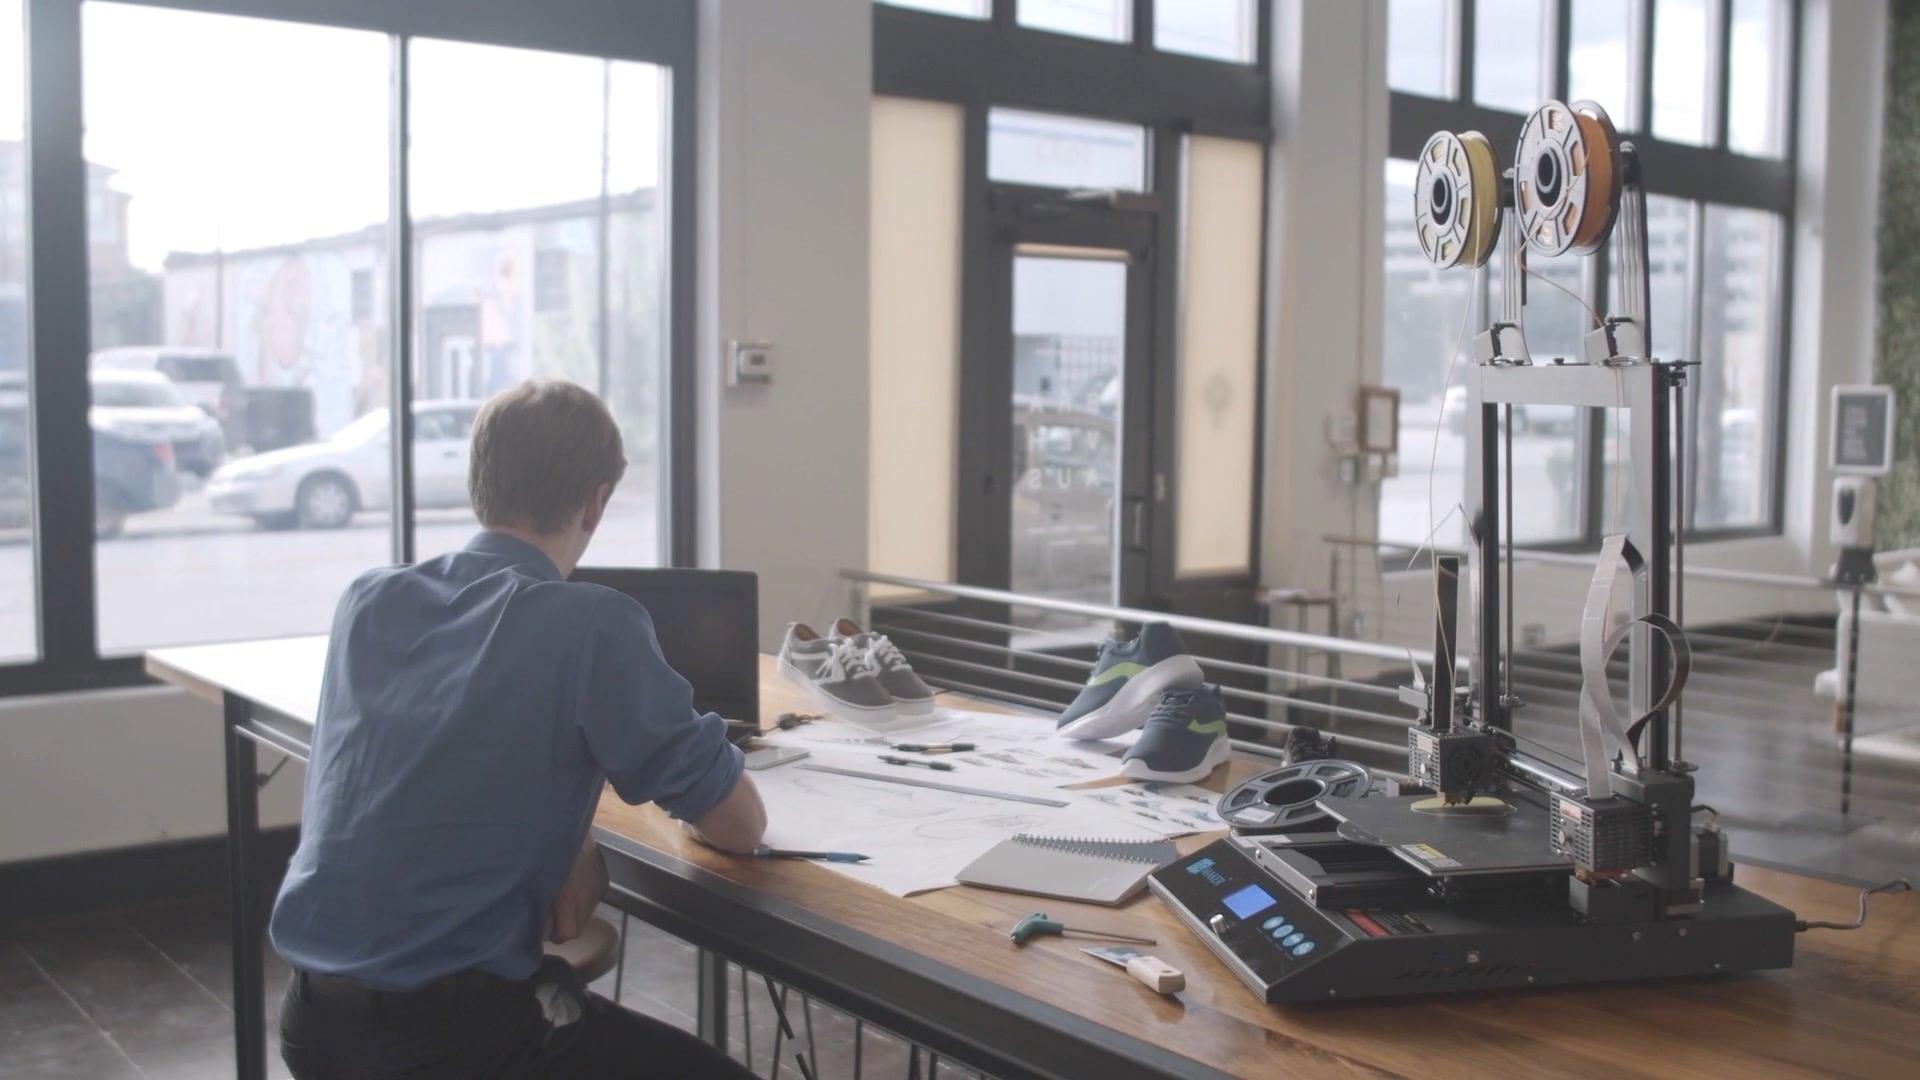 JGMaker Artist-D dual extruder independent 3D printer lets you use 4 different modes